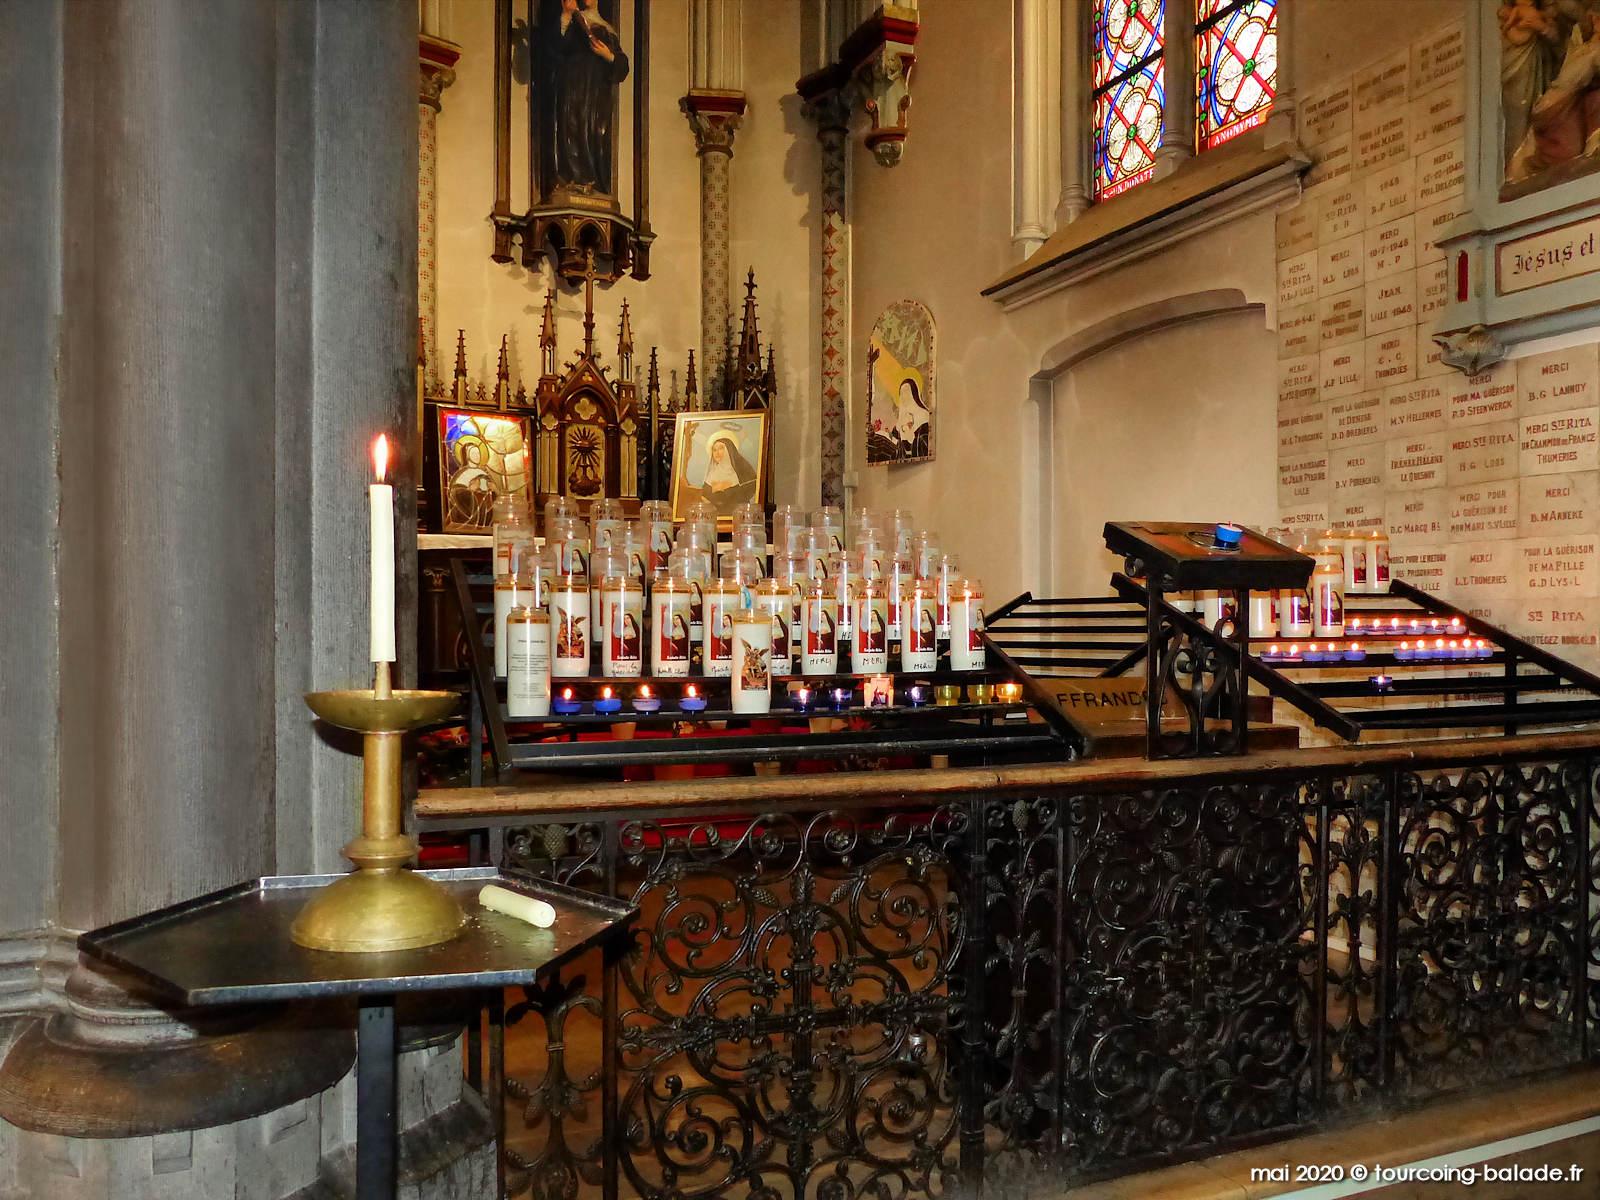 Église Sainte Rita, Vendeville - 2020